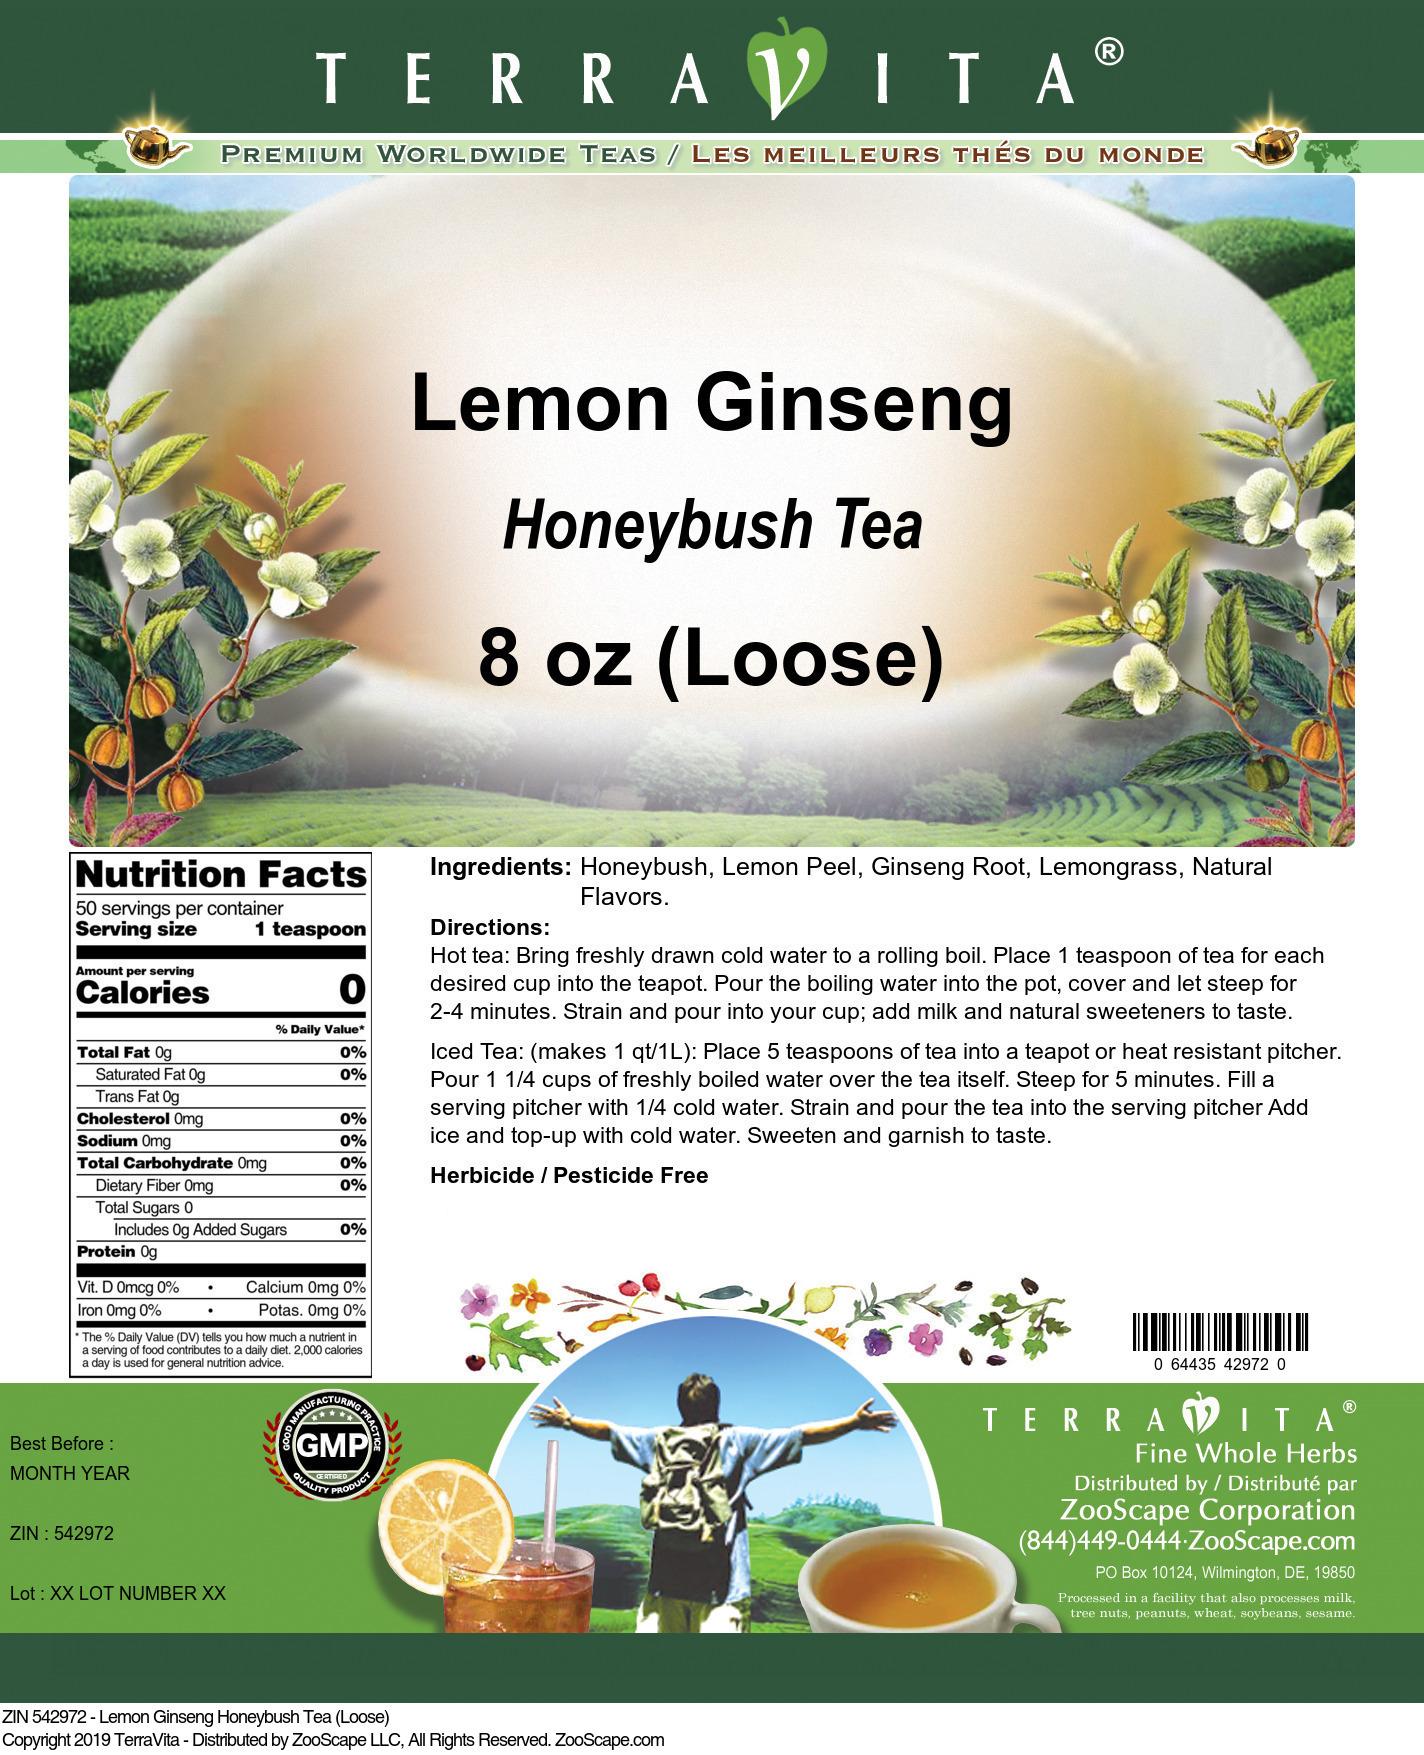 Lemon Ginseng Honeybush Tea